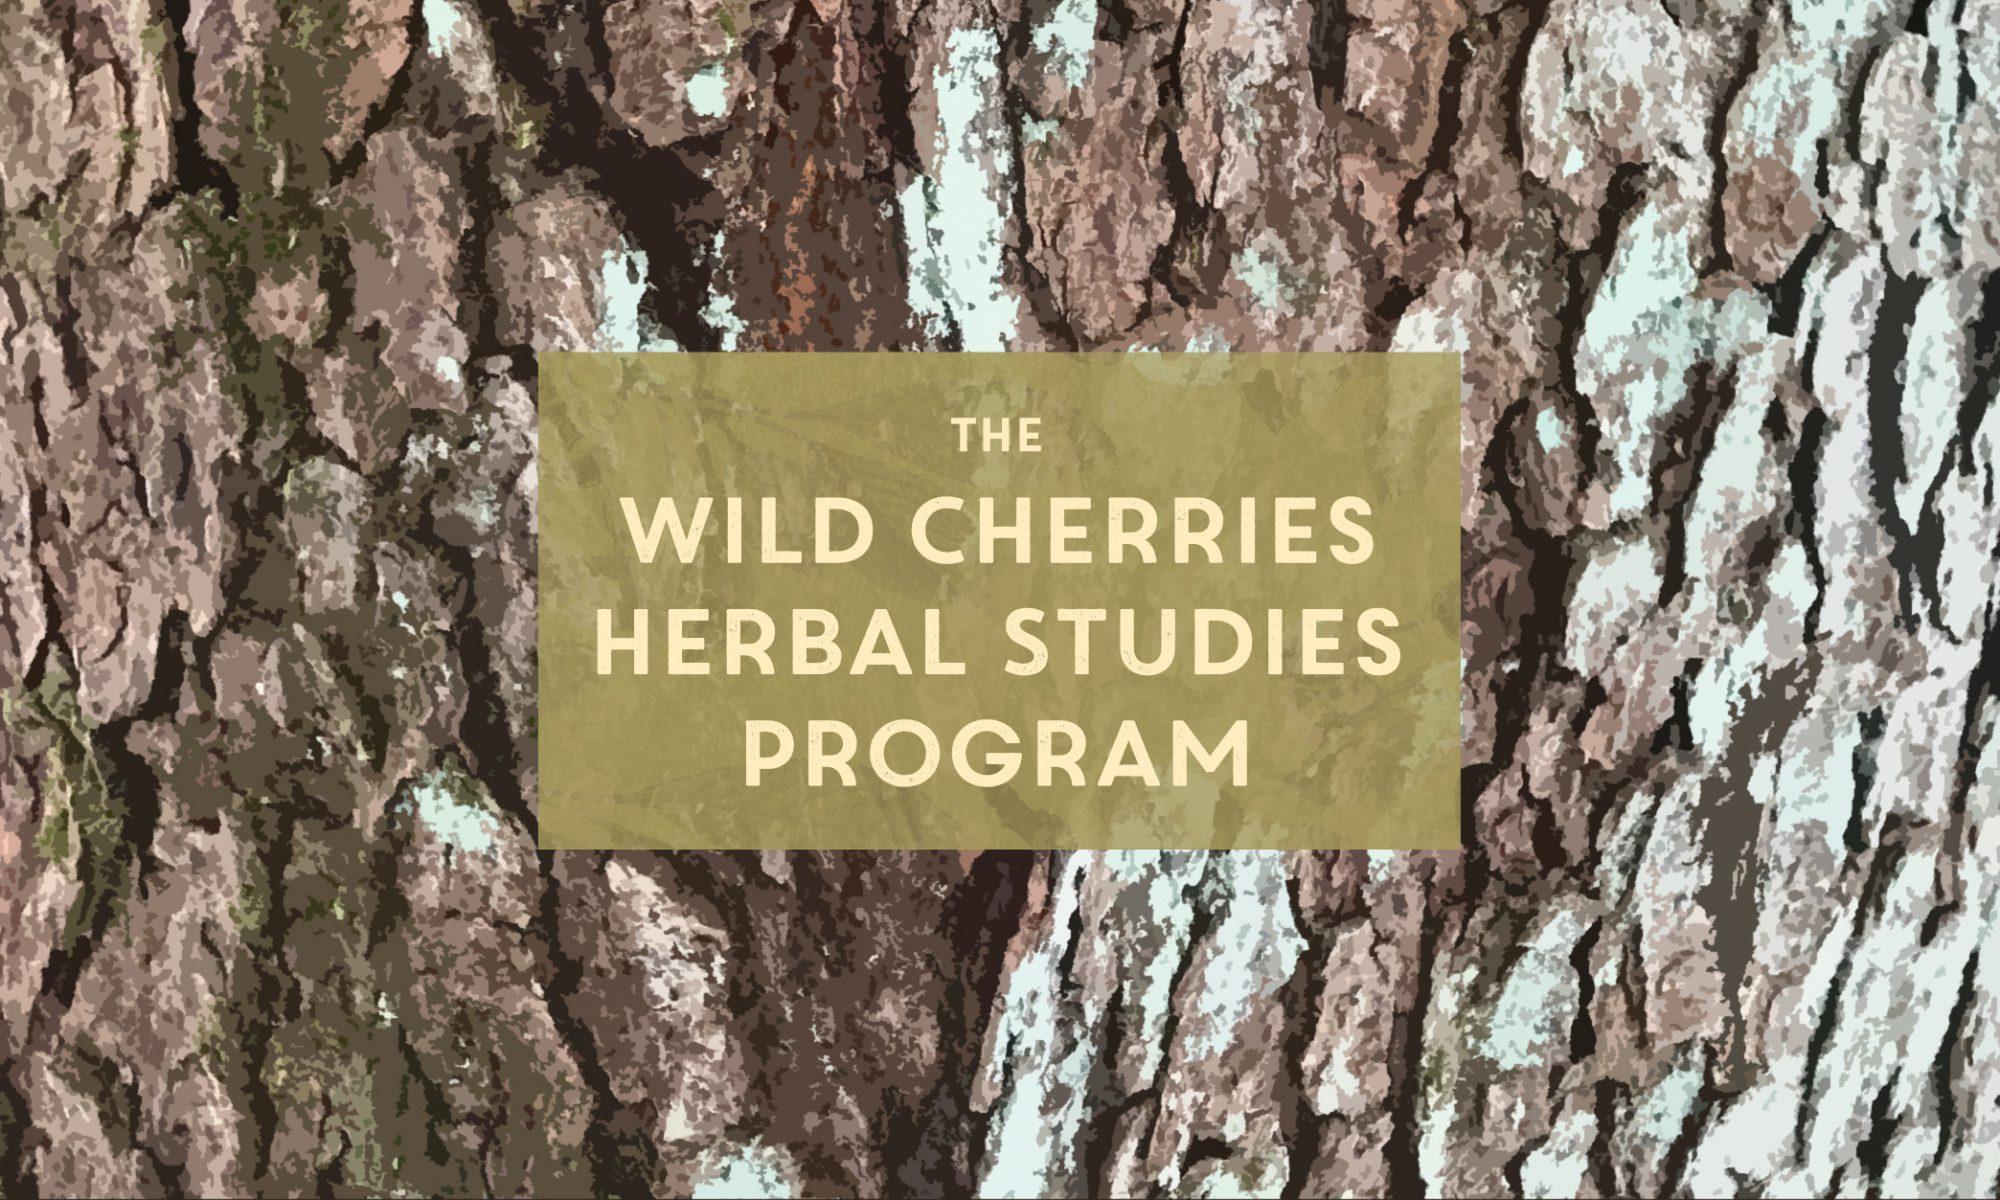 Text: Wild Cherries Herbal Studies Program, set on a background of cherry bark